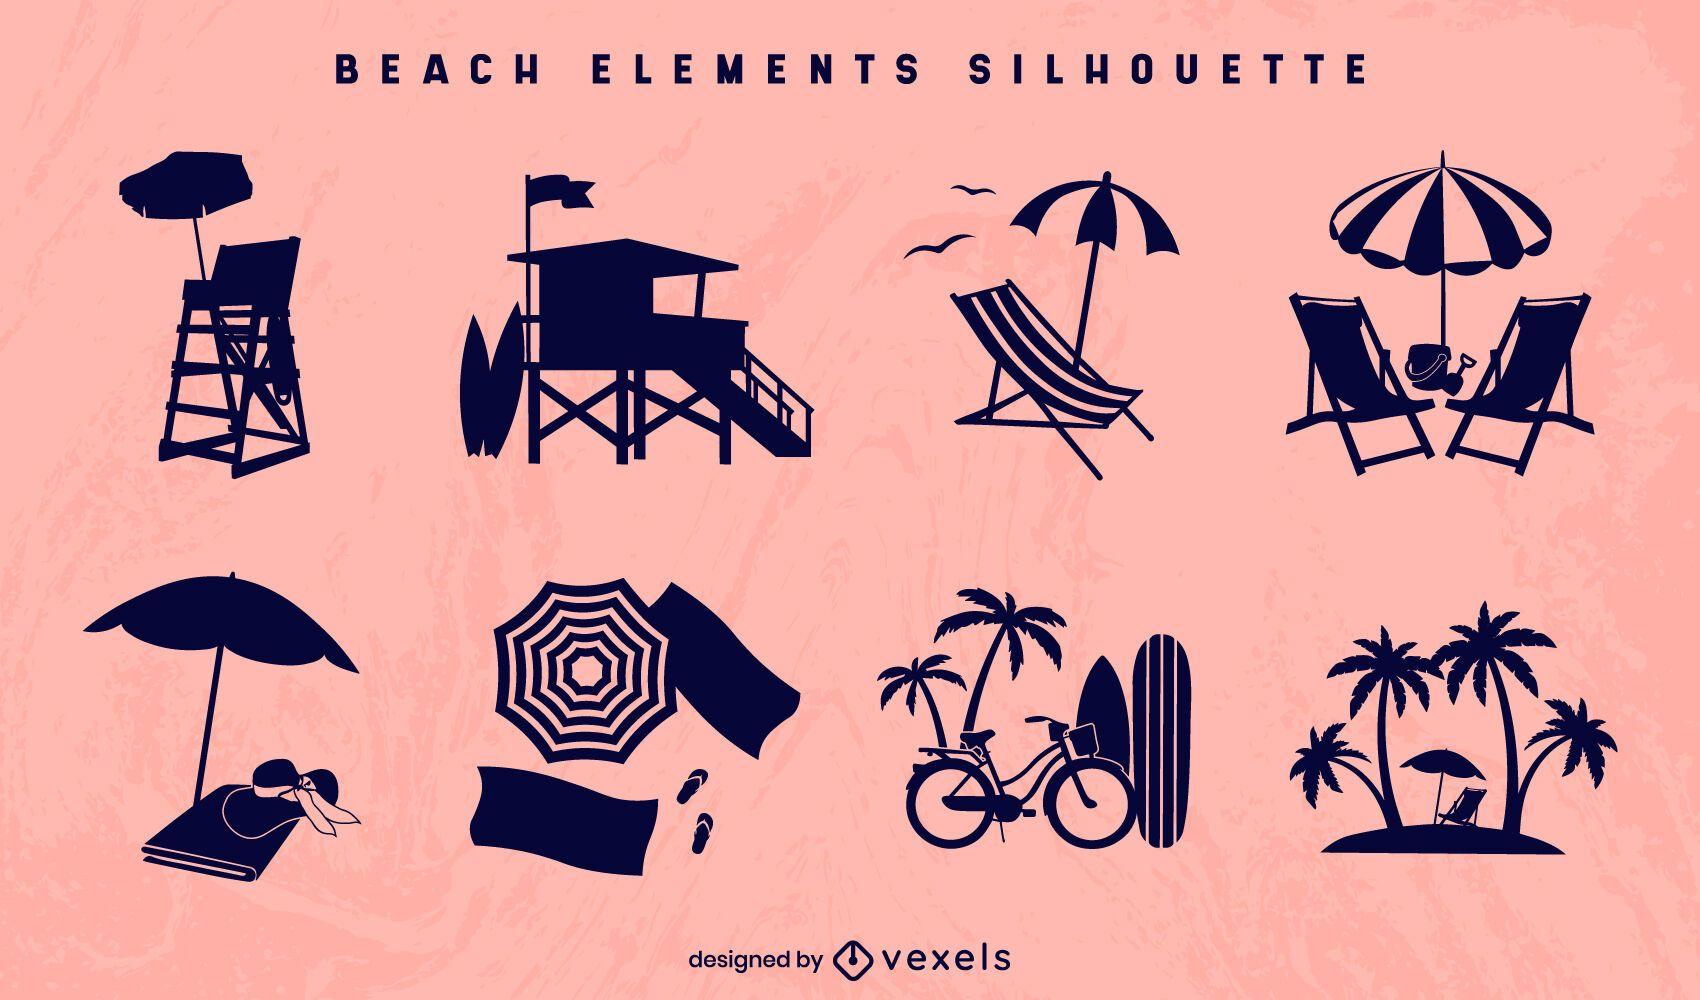 Beach element silhouette set